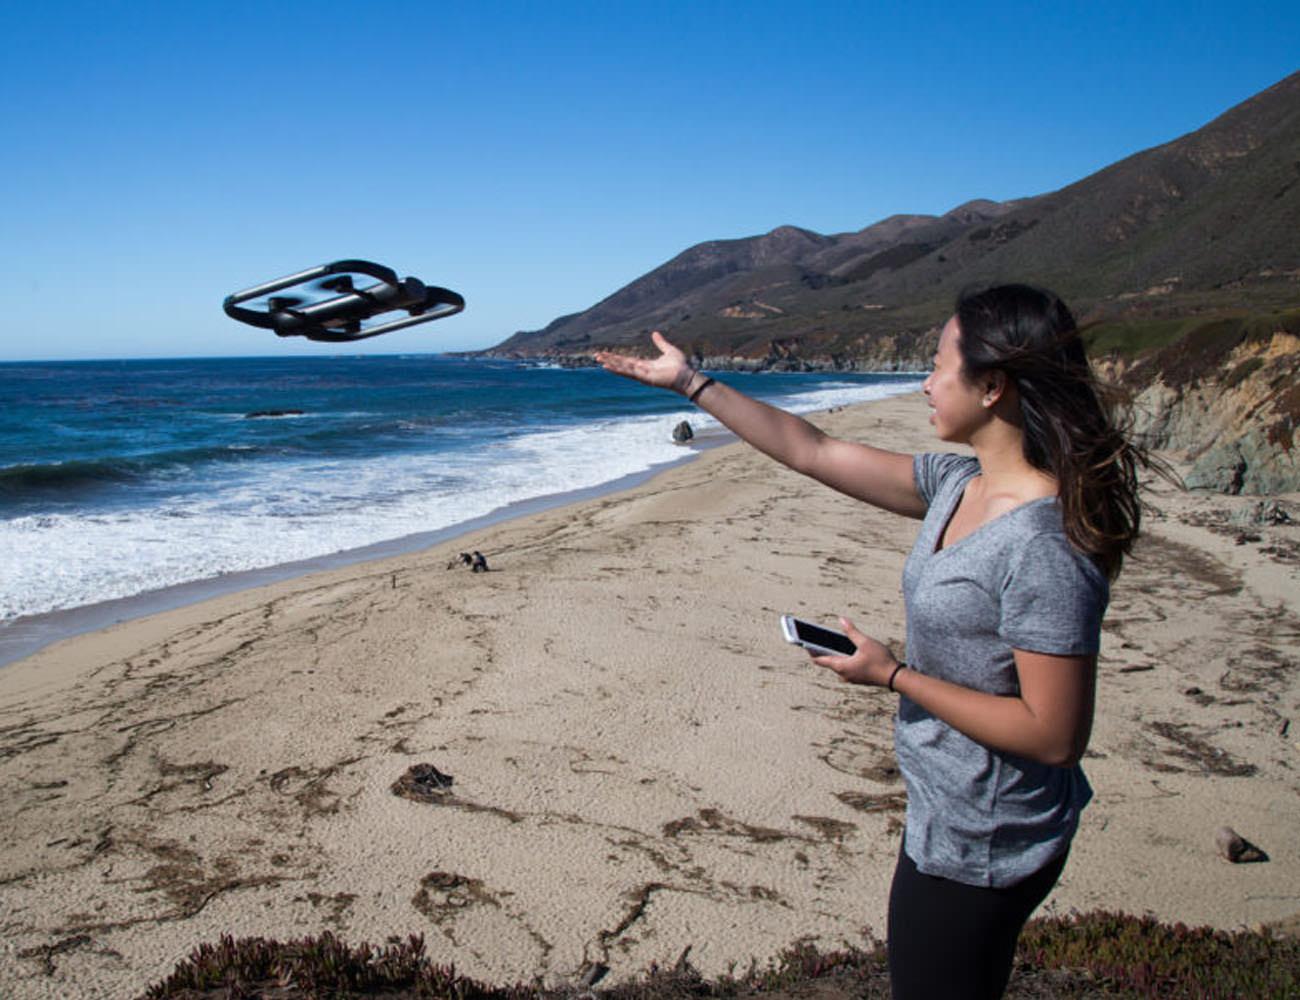 Skydio R1 Self Flying Video Camera